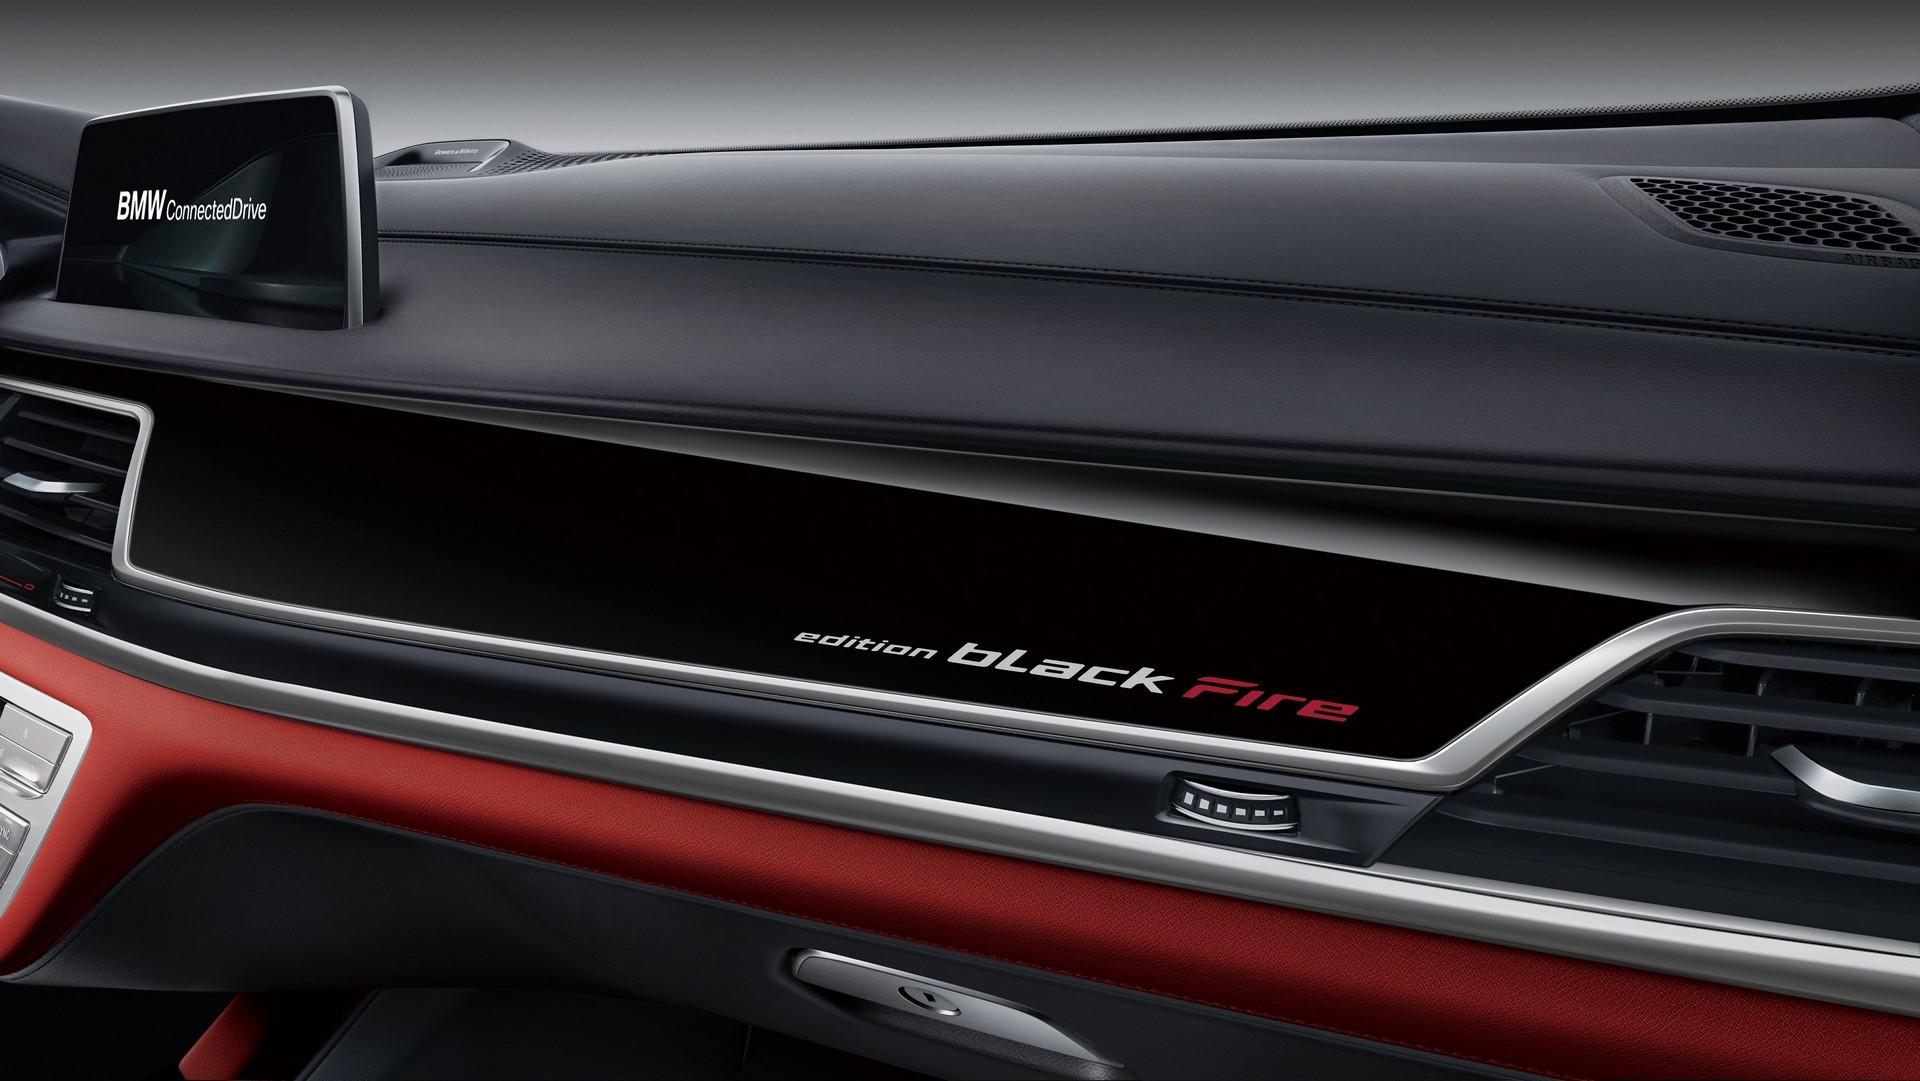 BMW 7-Series Black Fire Edition (5)